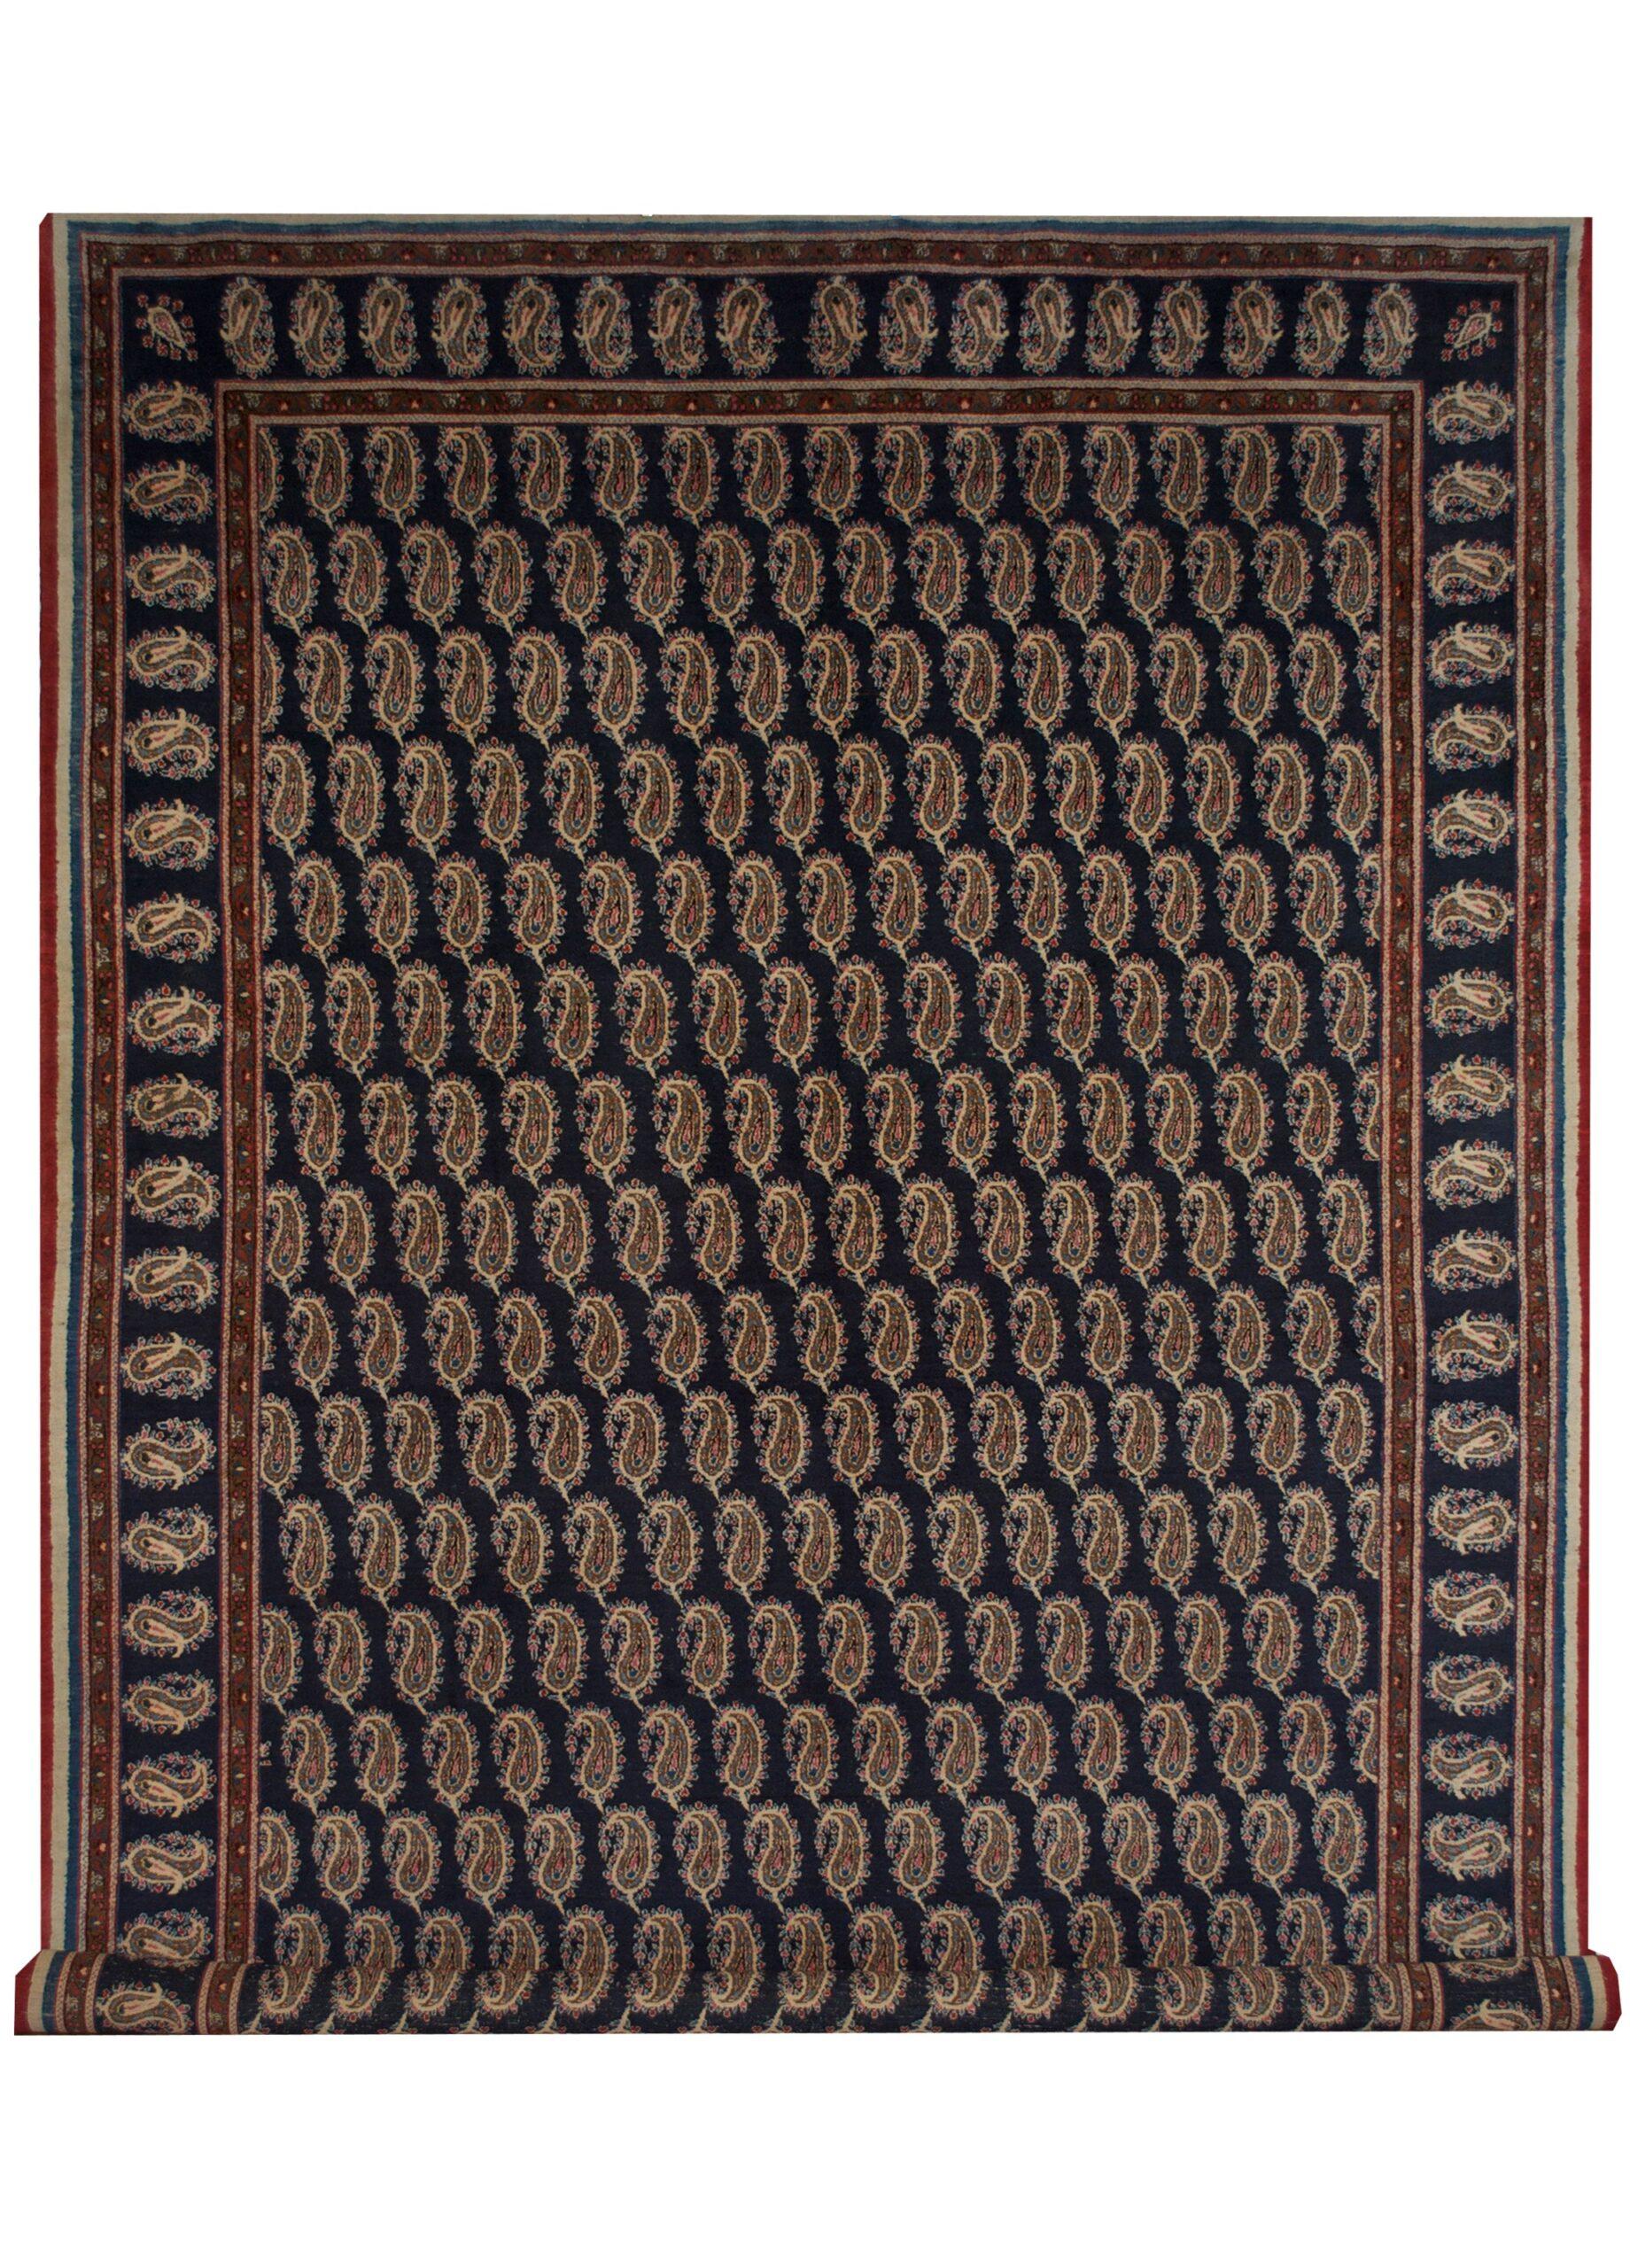 "Vintage Persian Mashad 8' 6"" x 12' 4"" Handmade Area Rug - Shabahang Royal Carpet"